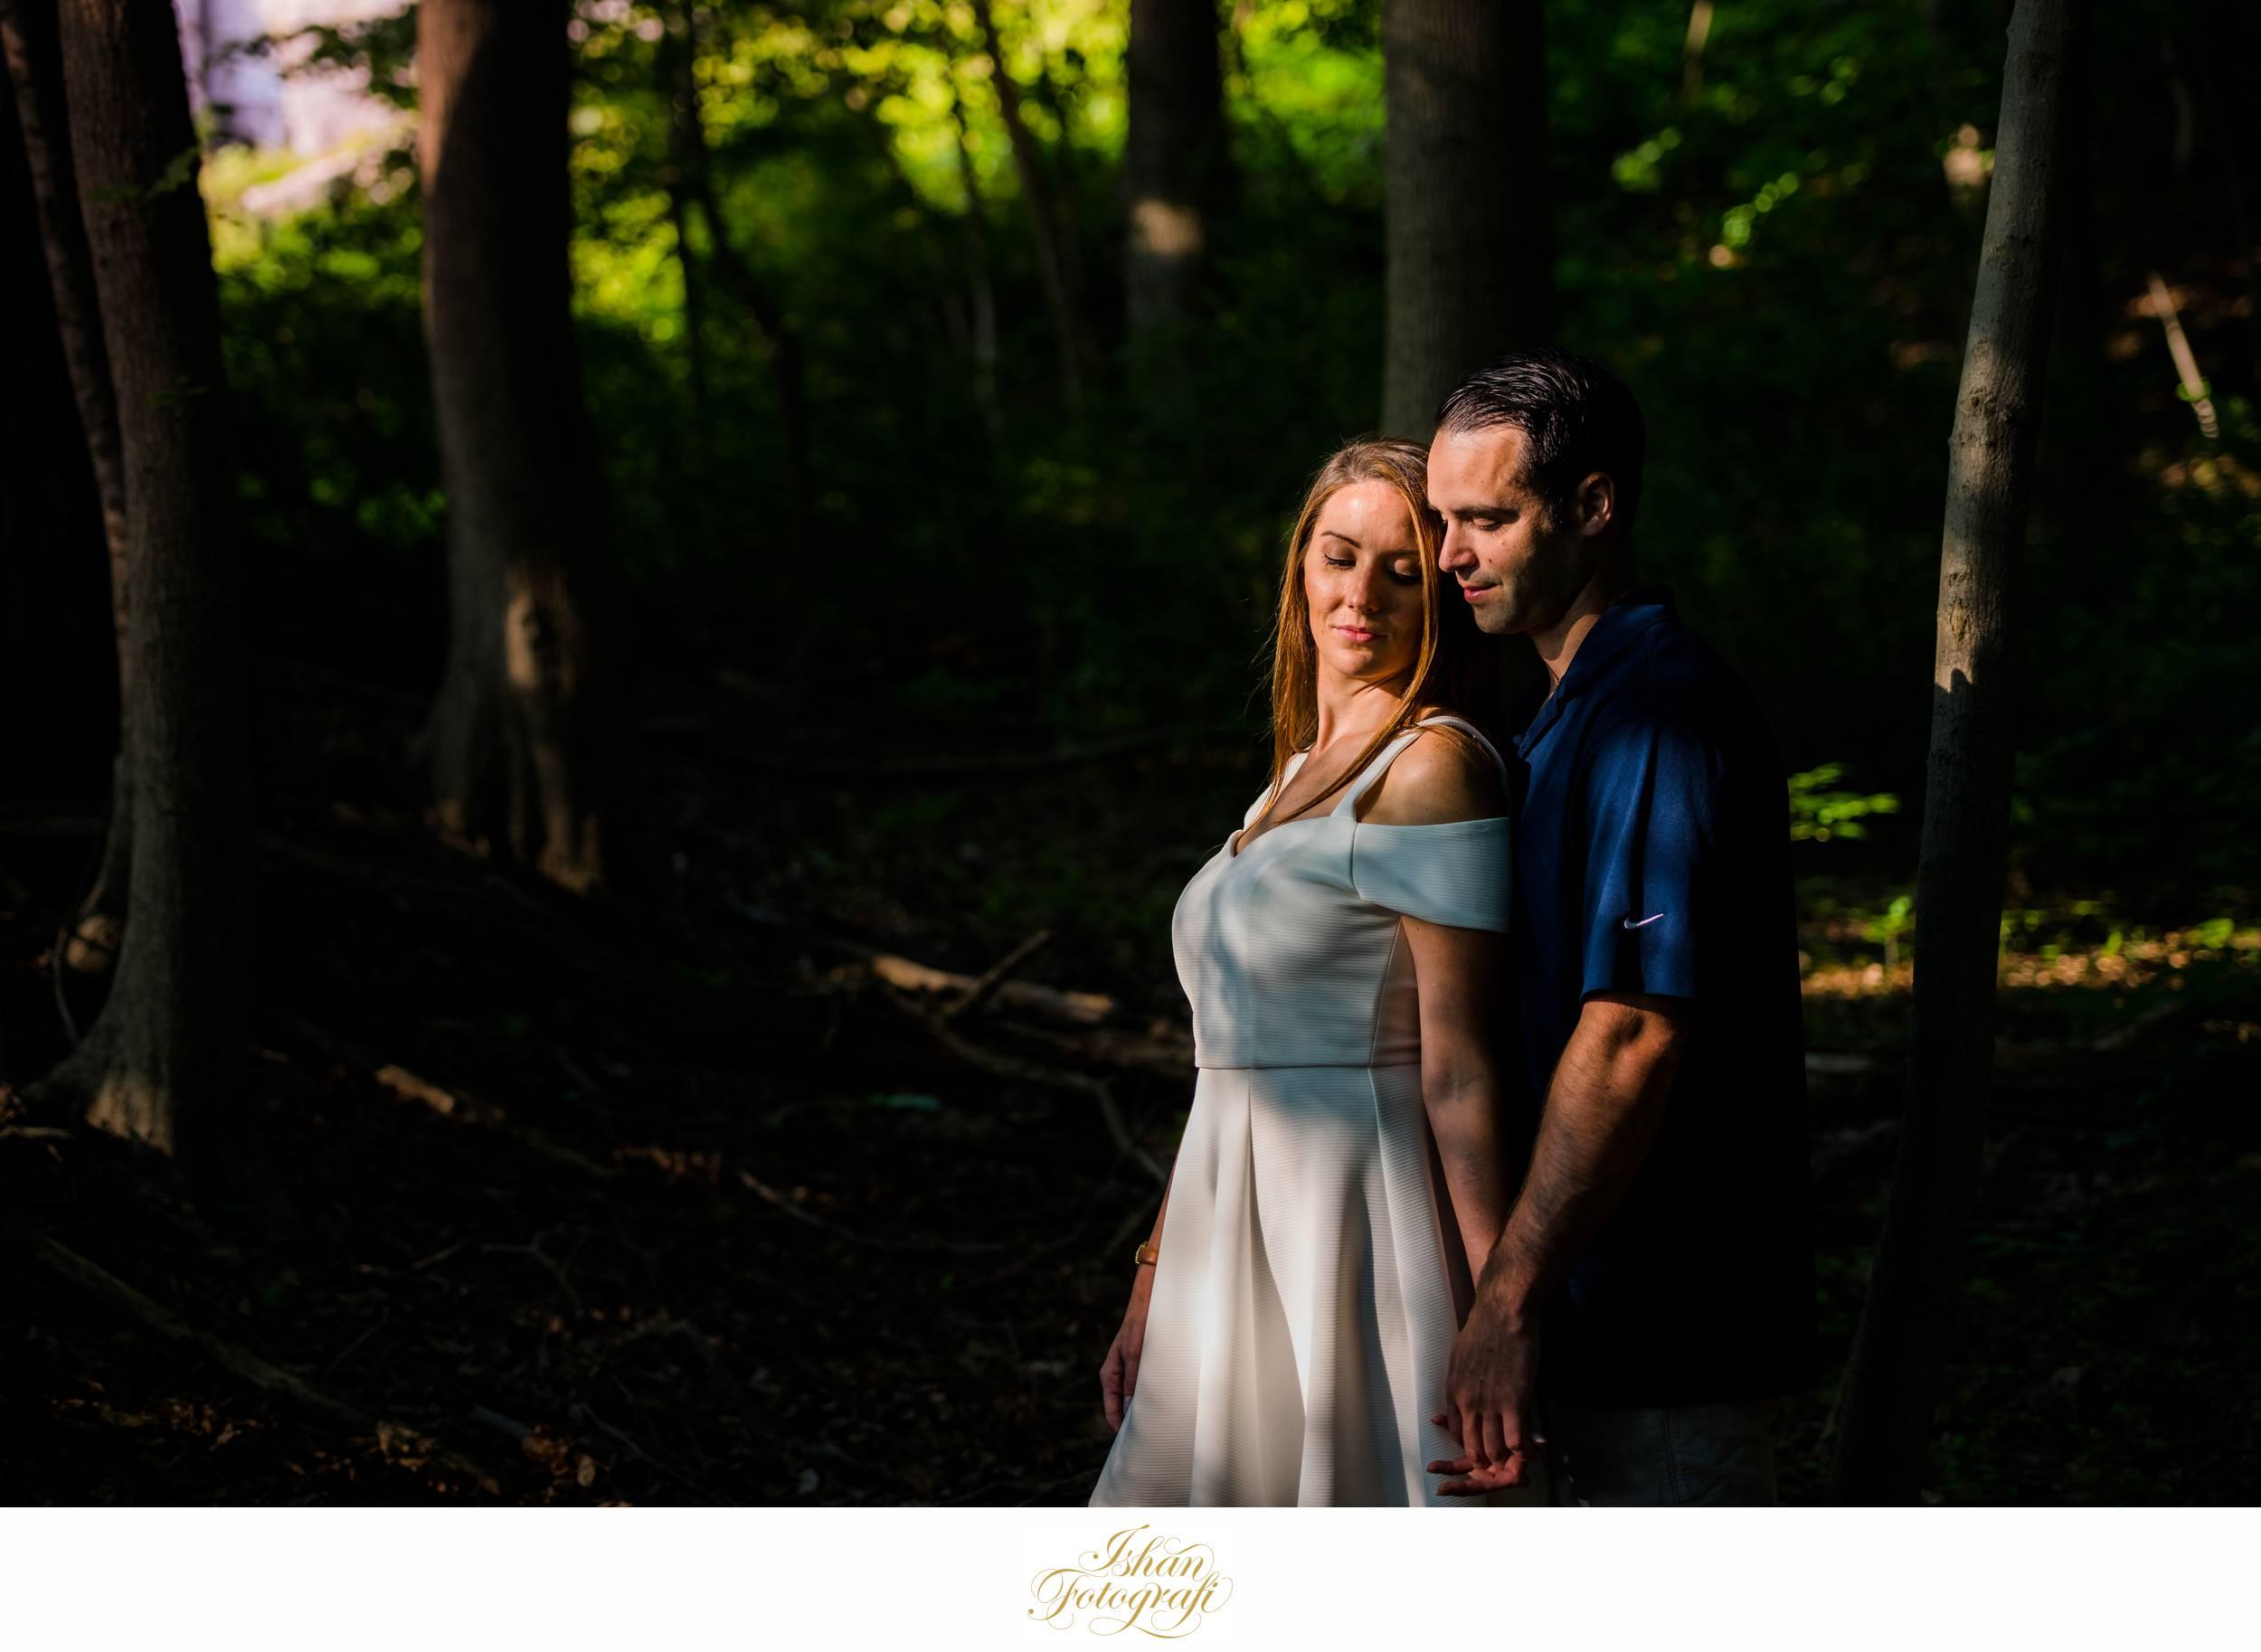 creative-engagement-photographer-new-york